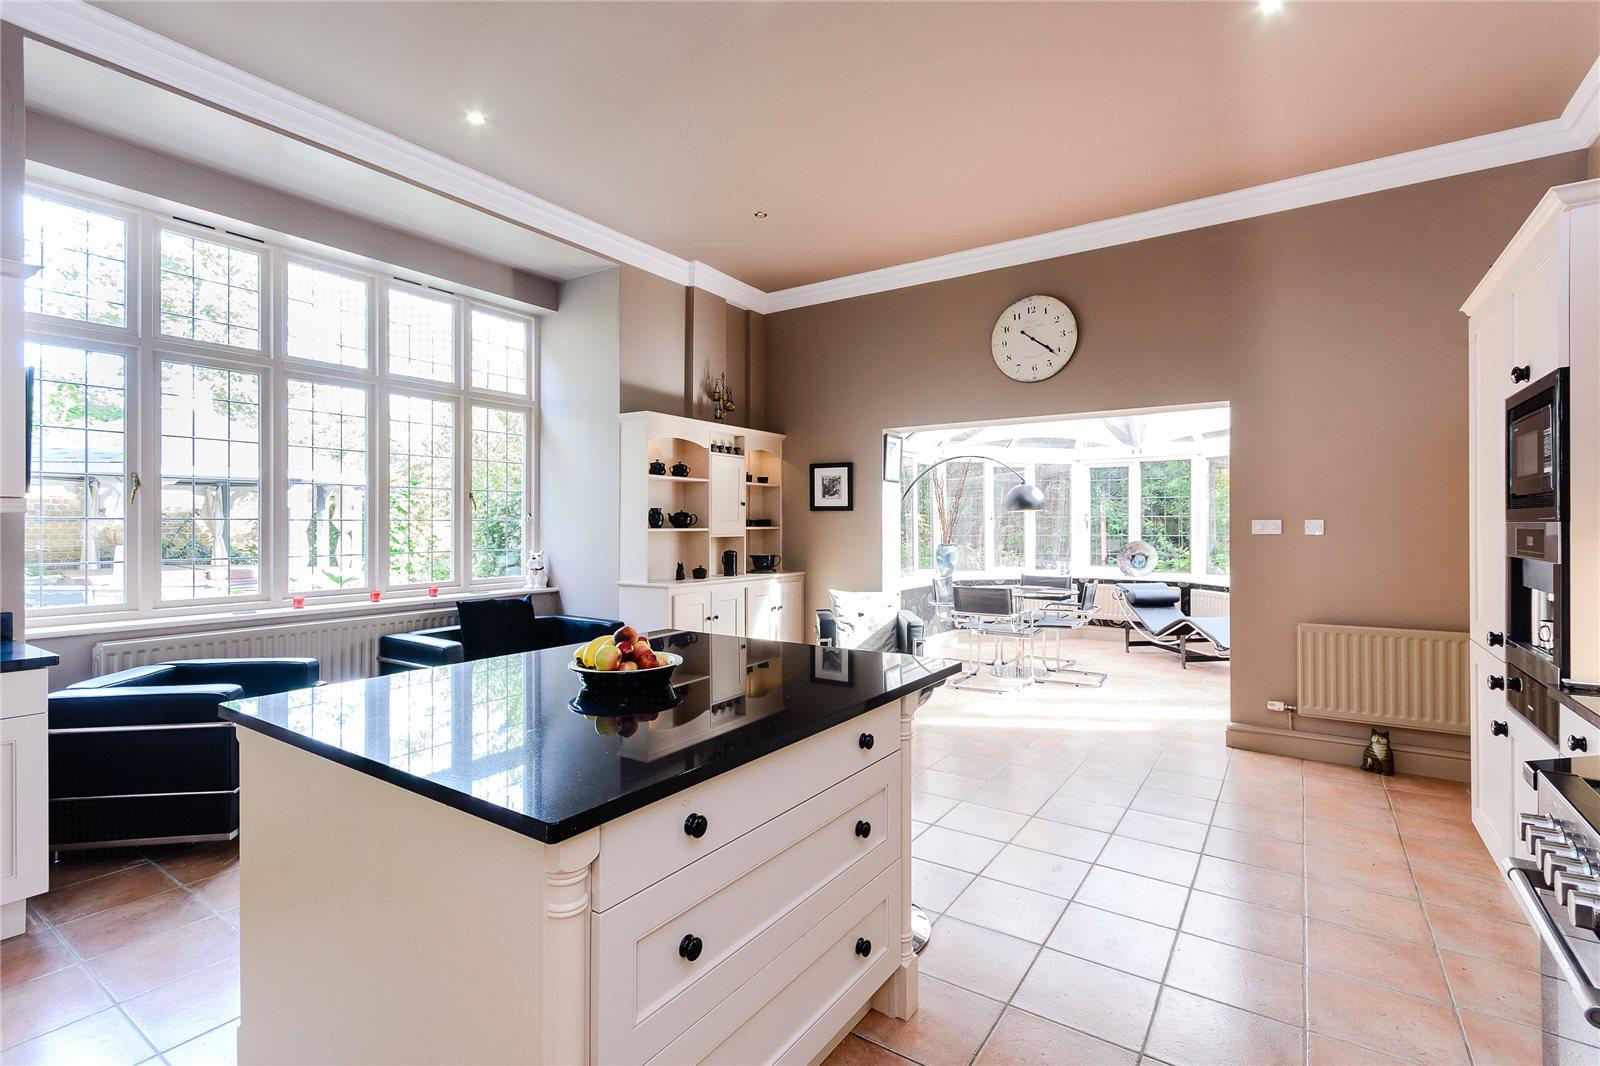 Additional photo for property listing at Kemsley Chase, Farnham Royal, Berkshire, SL2 Farnham Royal, 英格兰